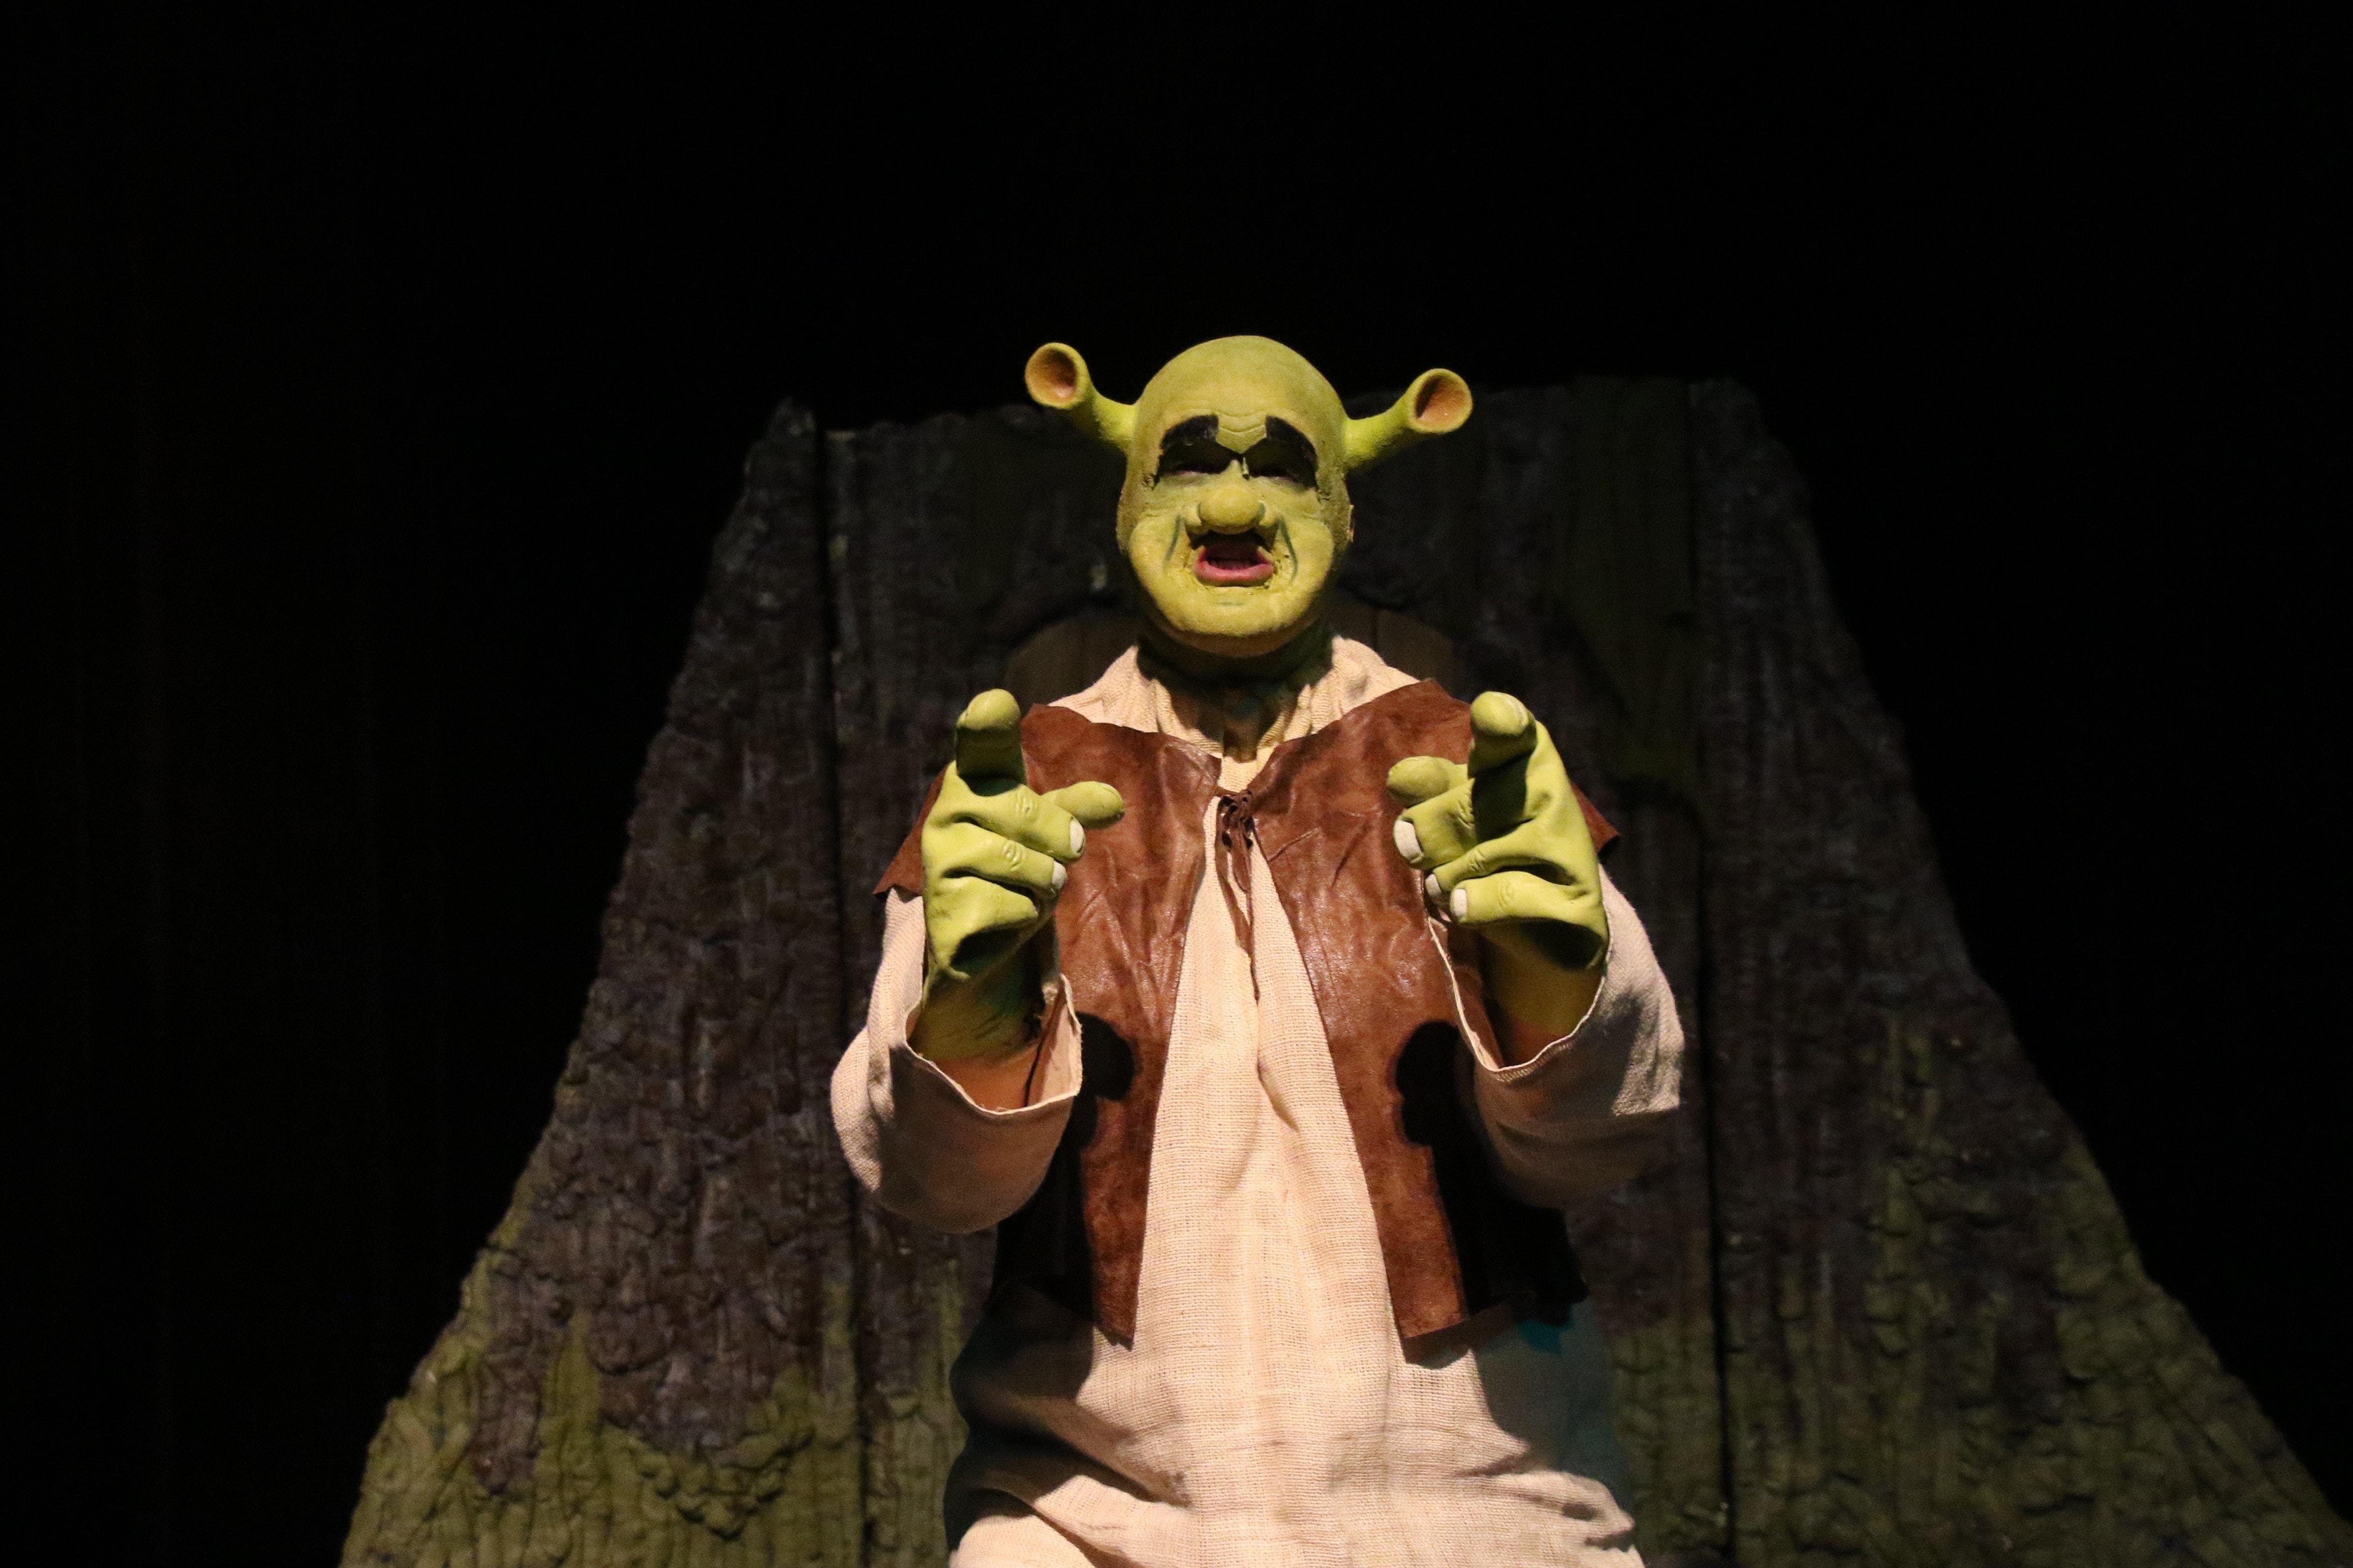 Dean Davis as Shrek in Charm City Players' production of Shrek the Musical. Photo by Shealyn Jae Photography.